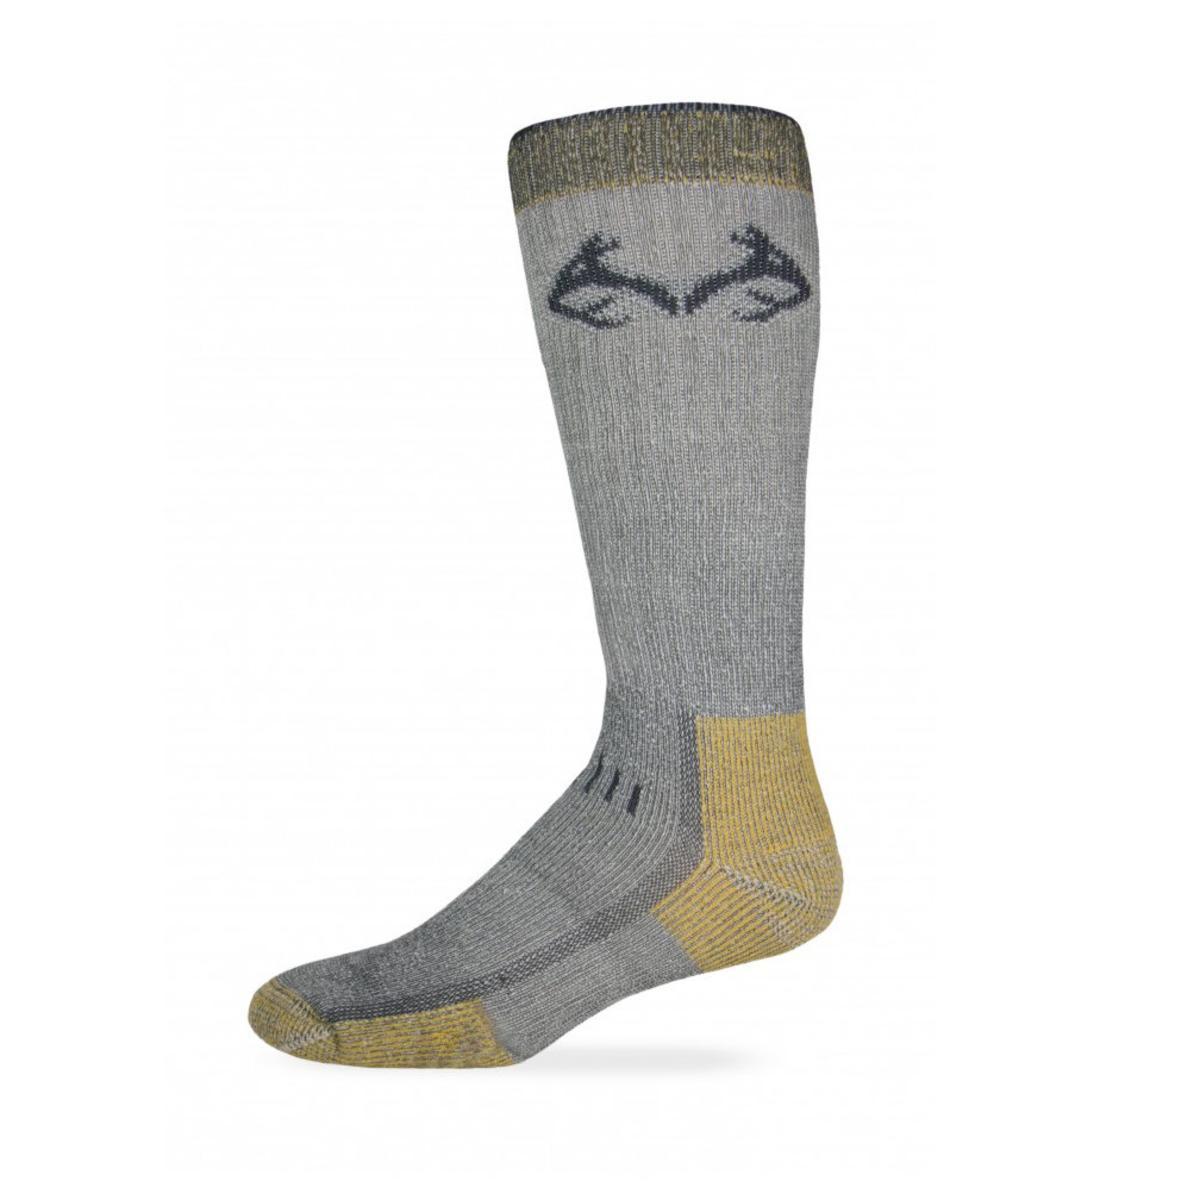 Details about RealTree 794 Uplander Heavyweight Merino Wool Boot Socks 62c99e86009